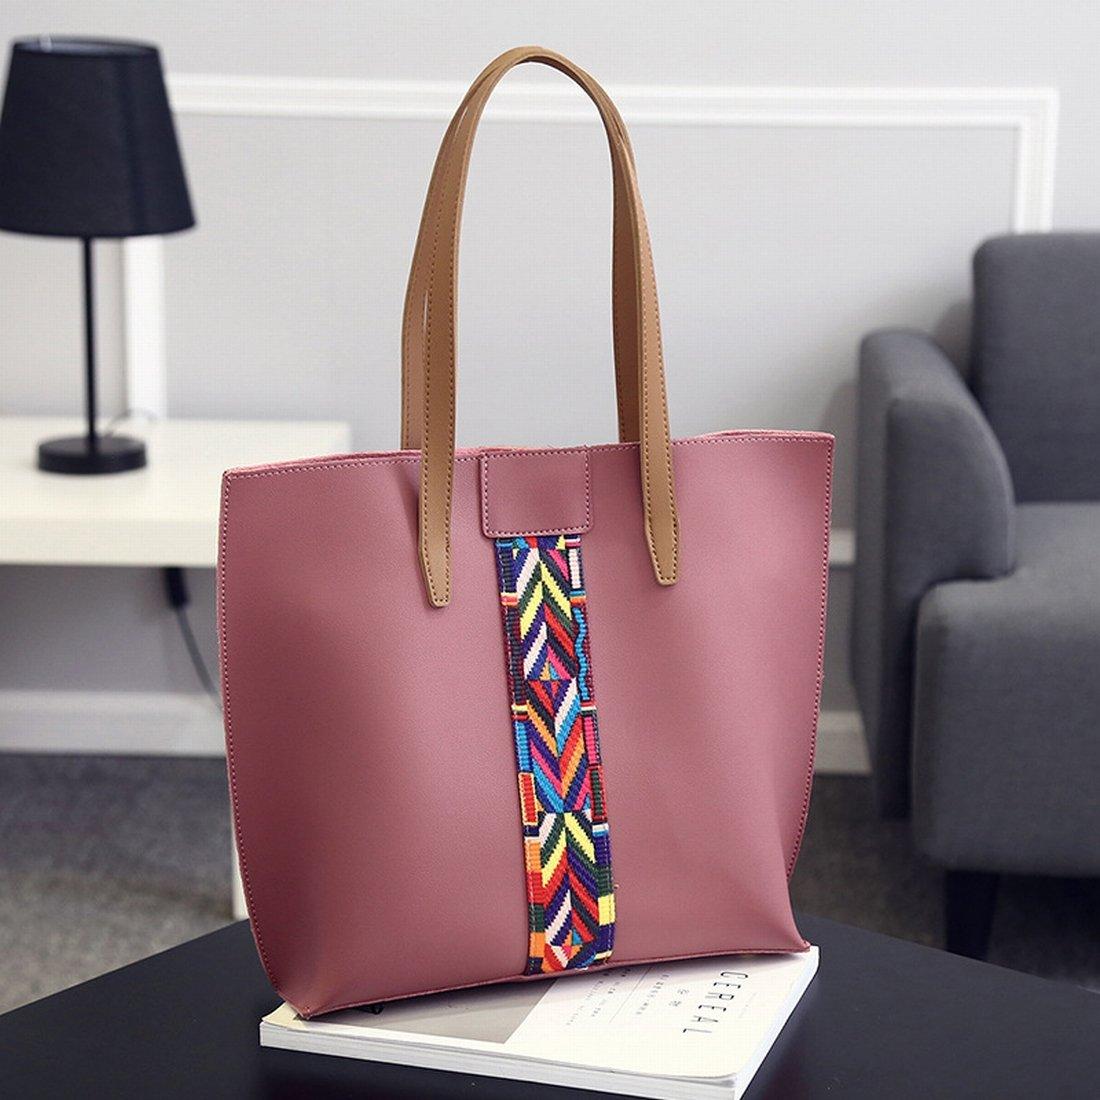 YTTY Sweet Fashion Damen Handtasche Messenger Bag Schultertasche